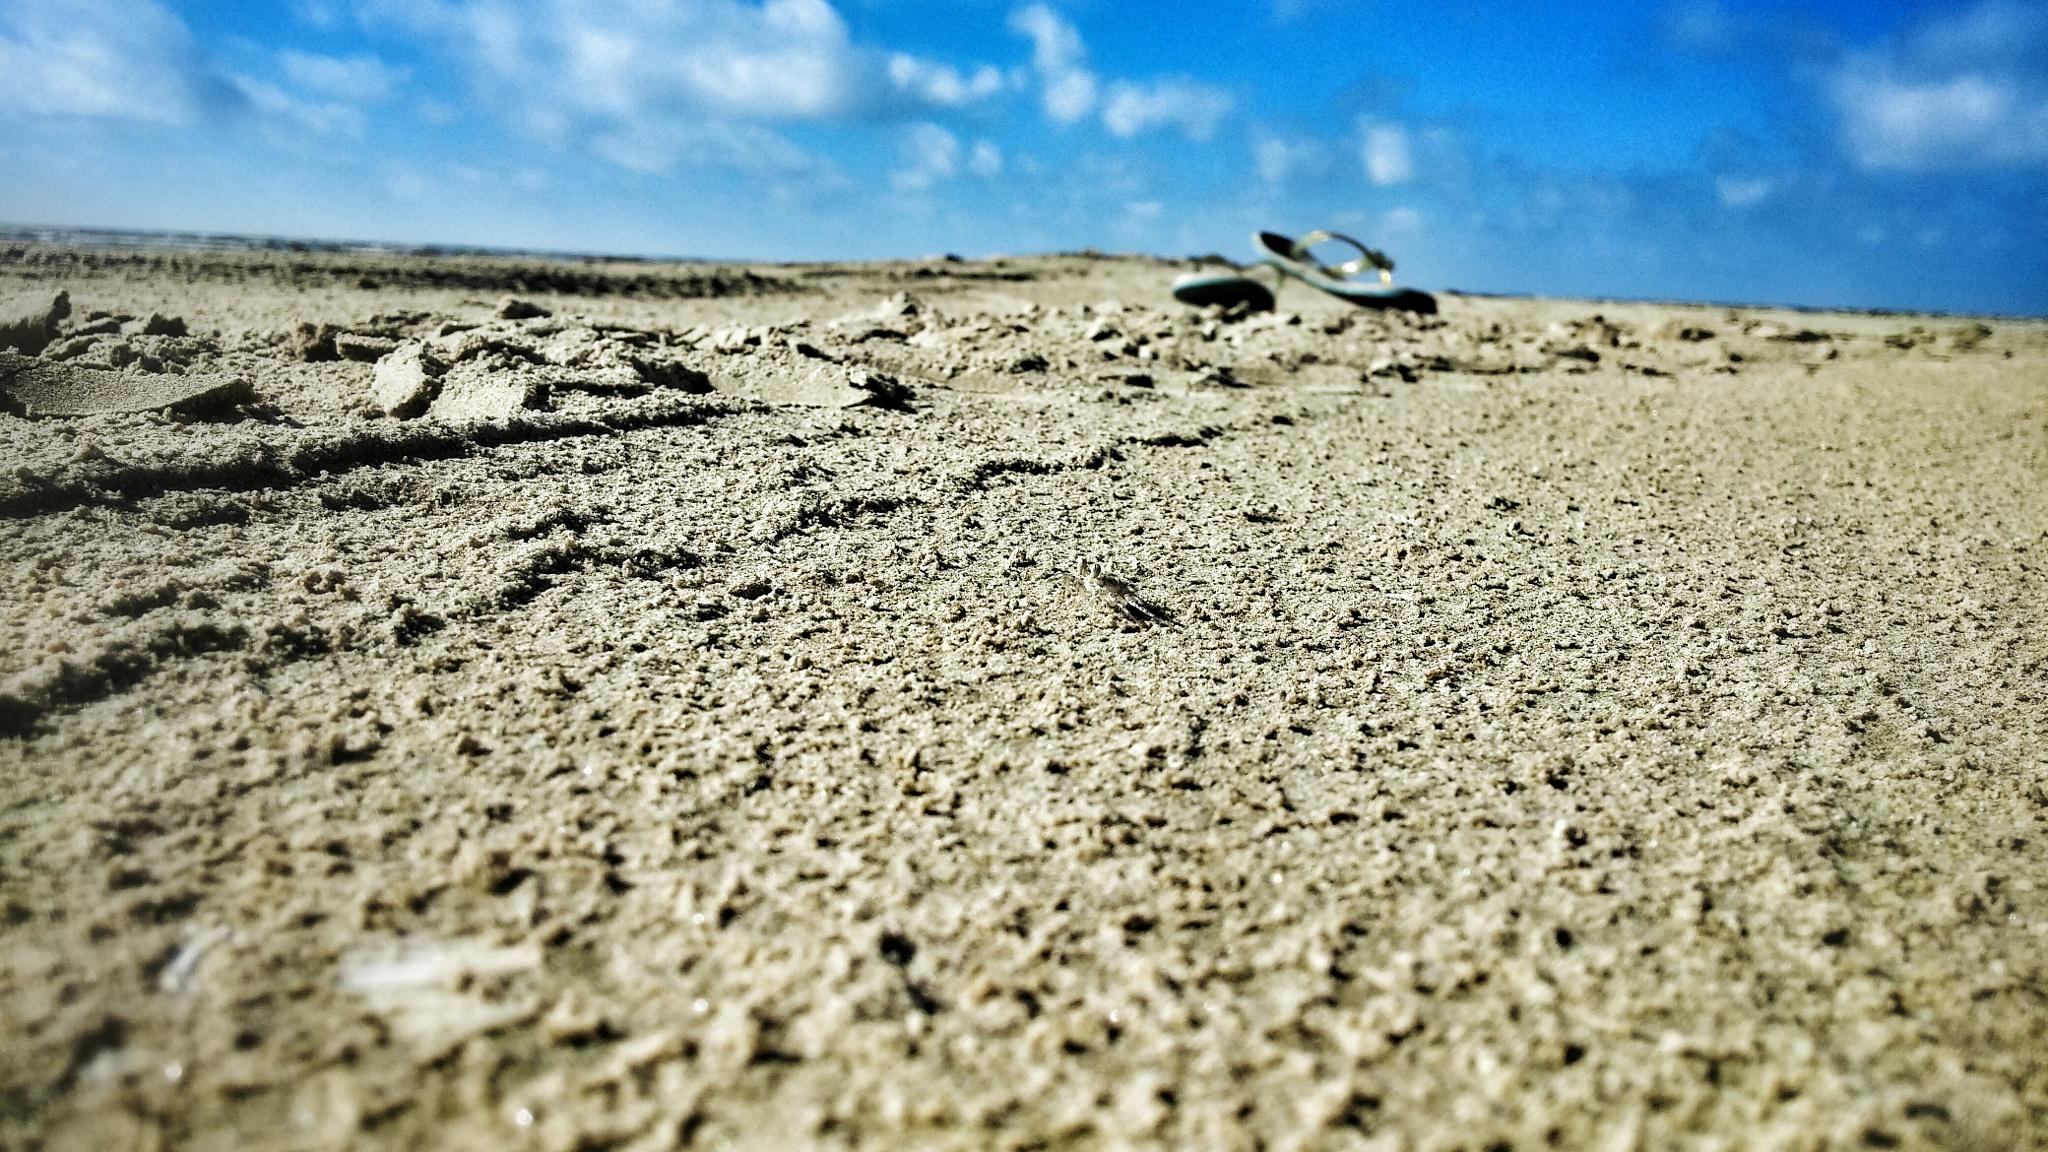 Sandy beach crab by ForeverMoreByAshley